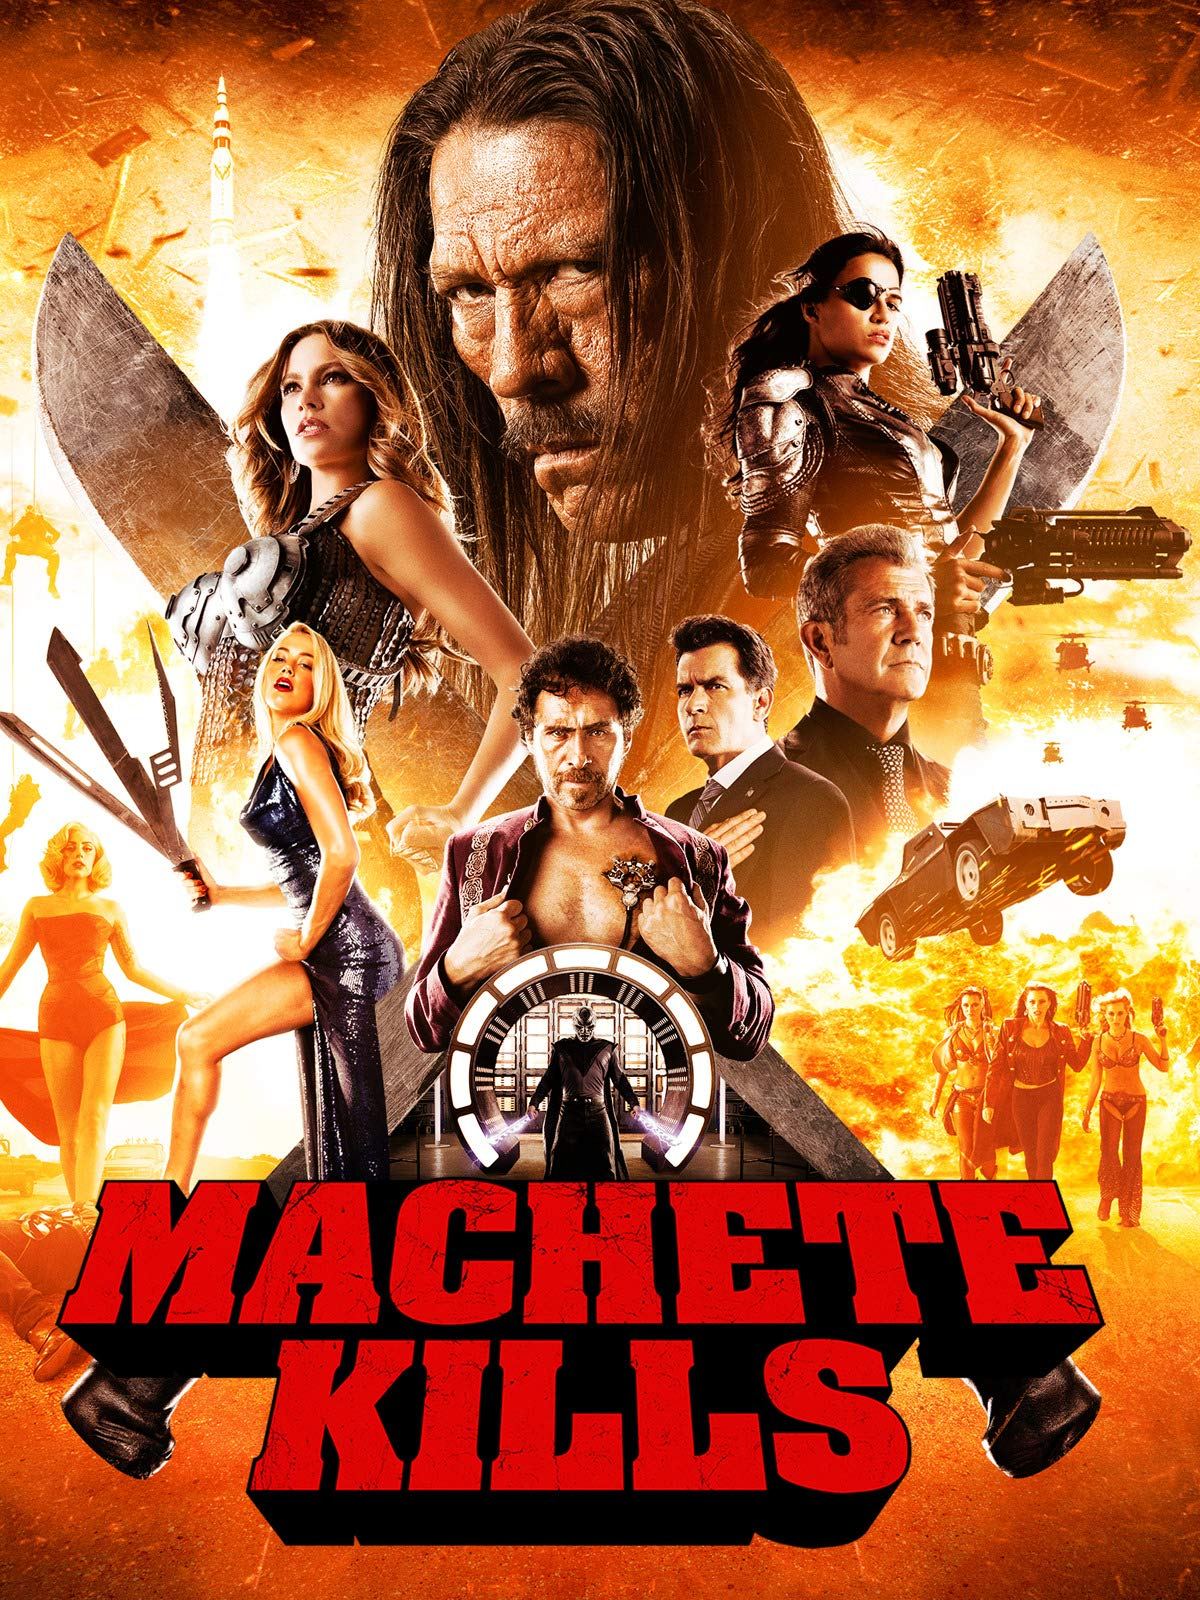 Machete Kills on Amazon Prime Video UK